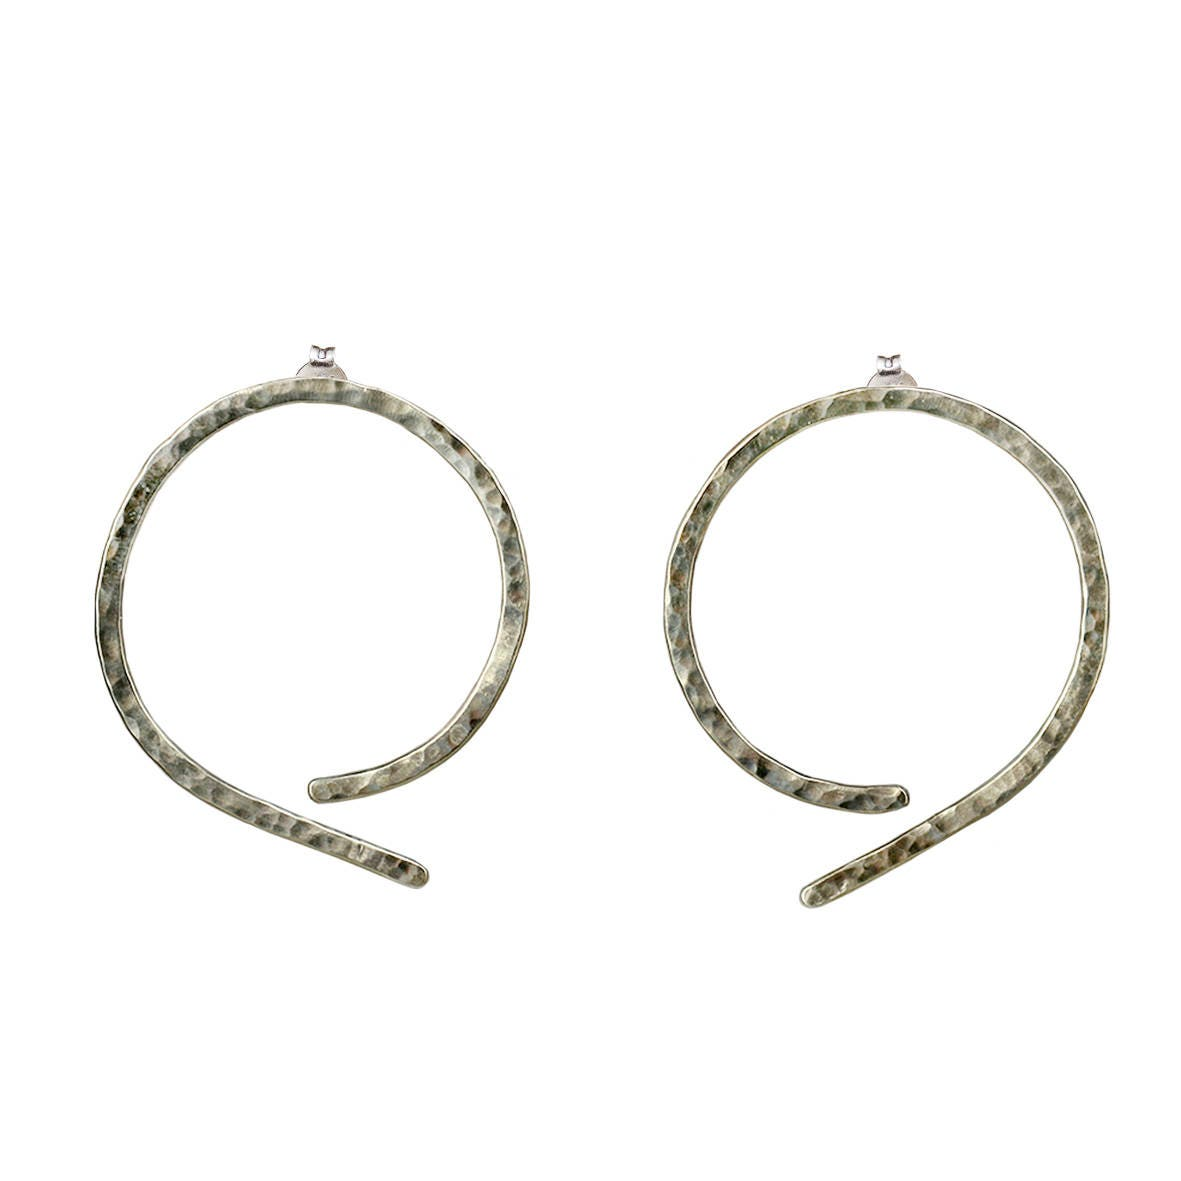 3ad5f90a9 Sterling silver thin hammered hoop earrings, simple large stud hoops ...